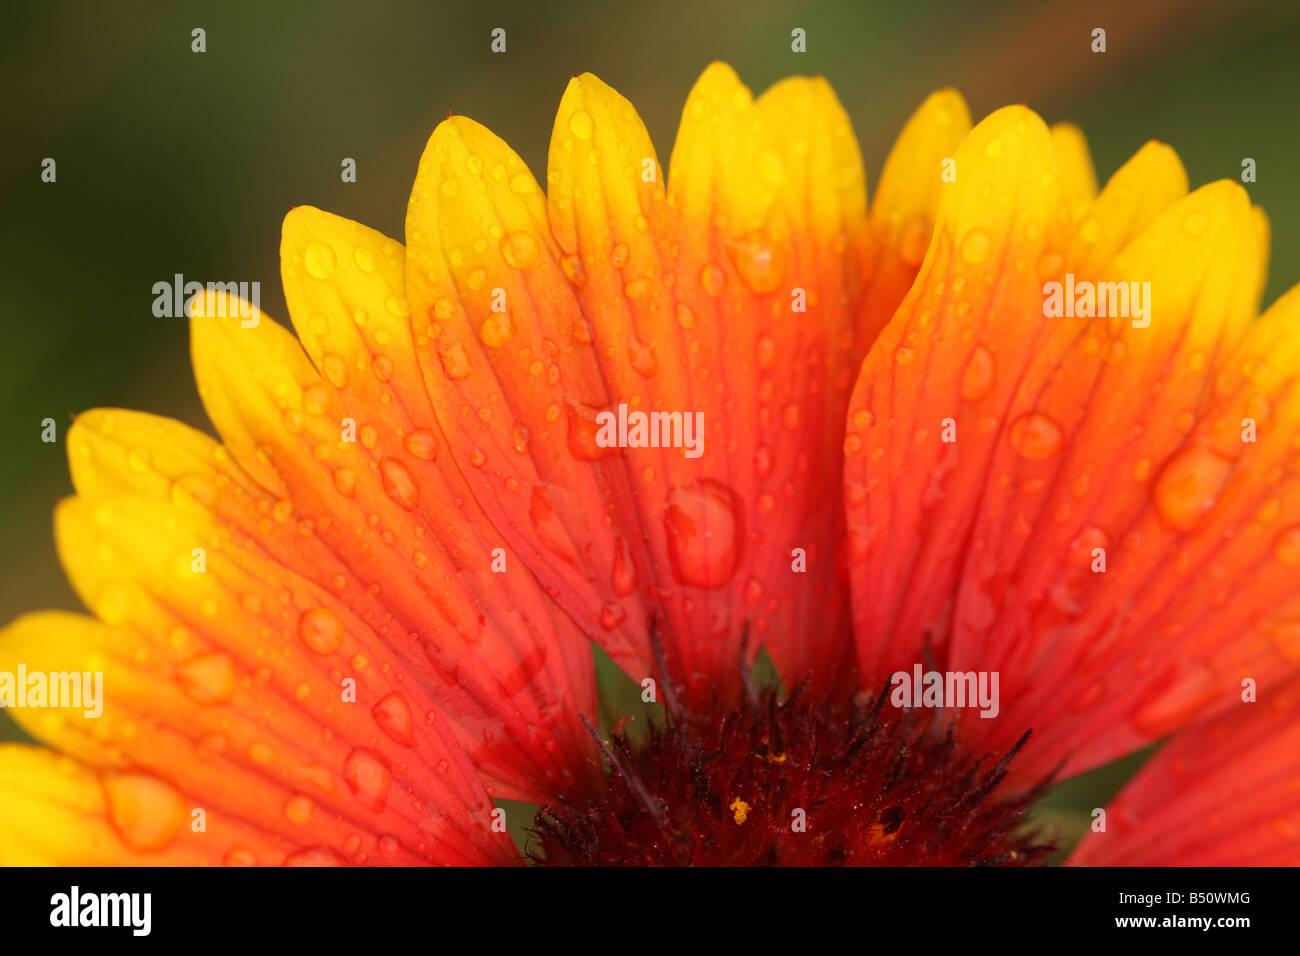 wet flower petals after rain storm. - Stock Image